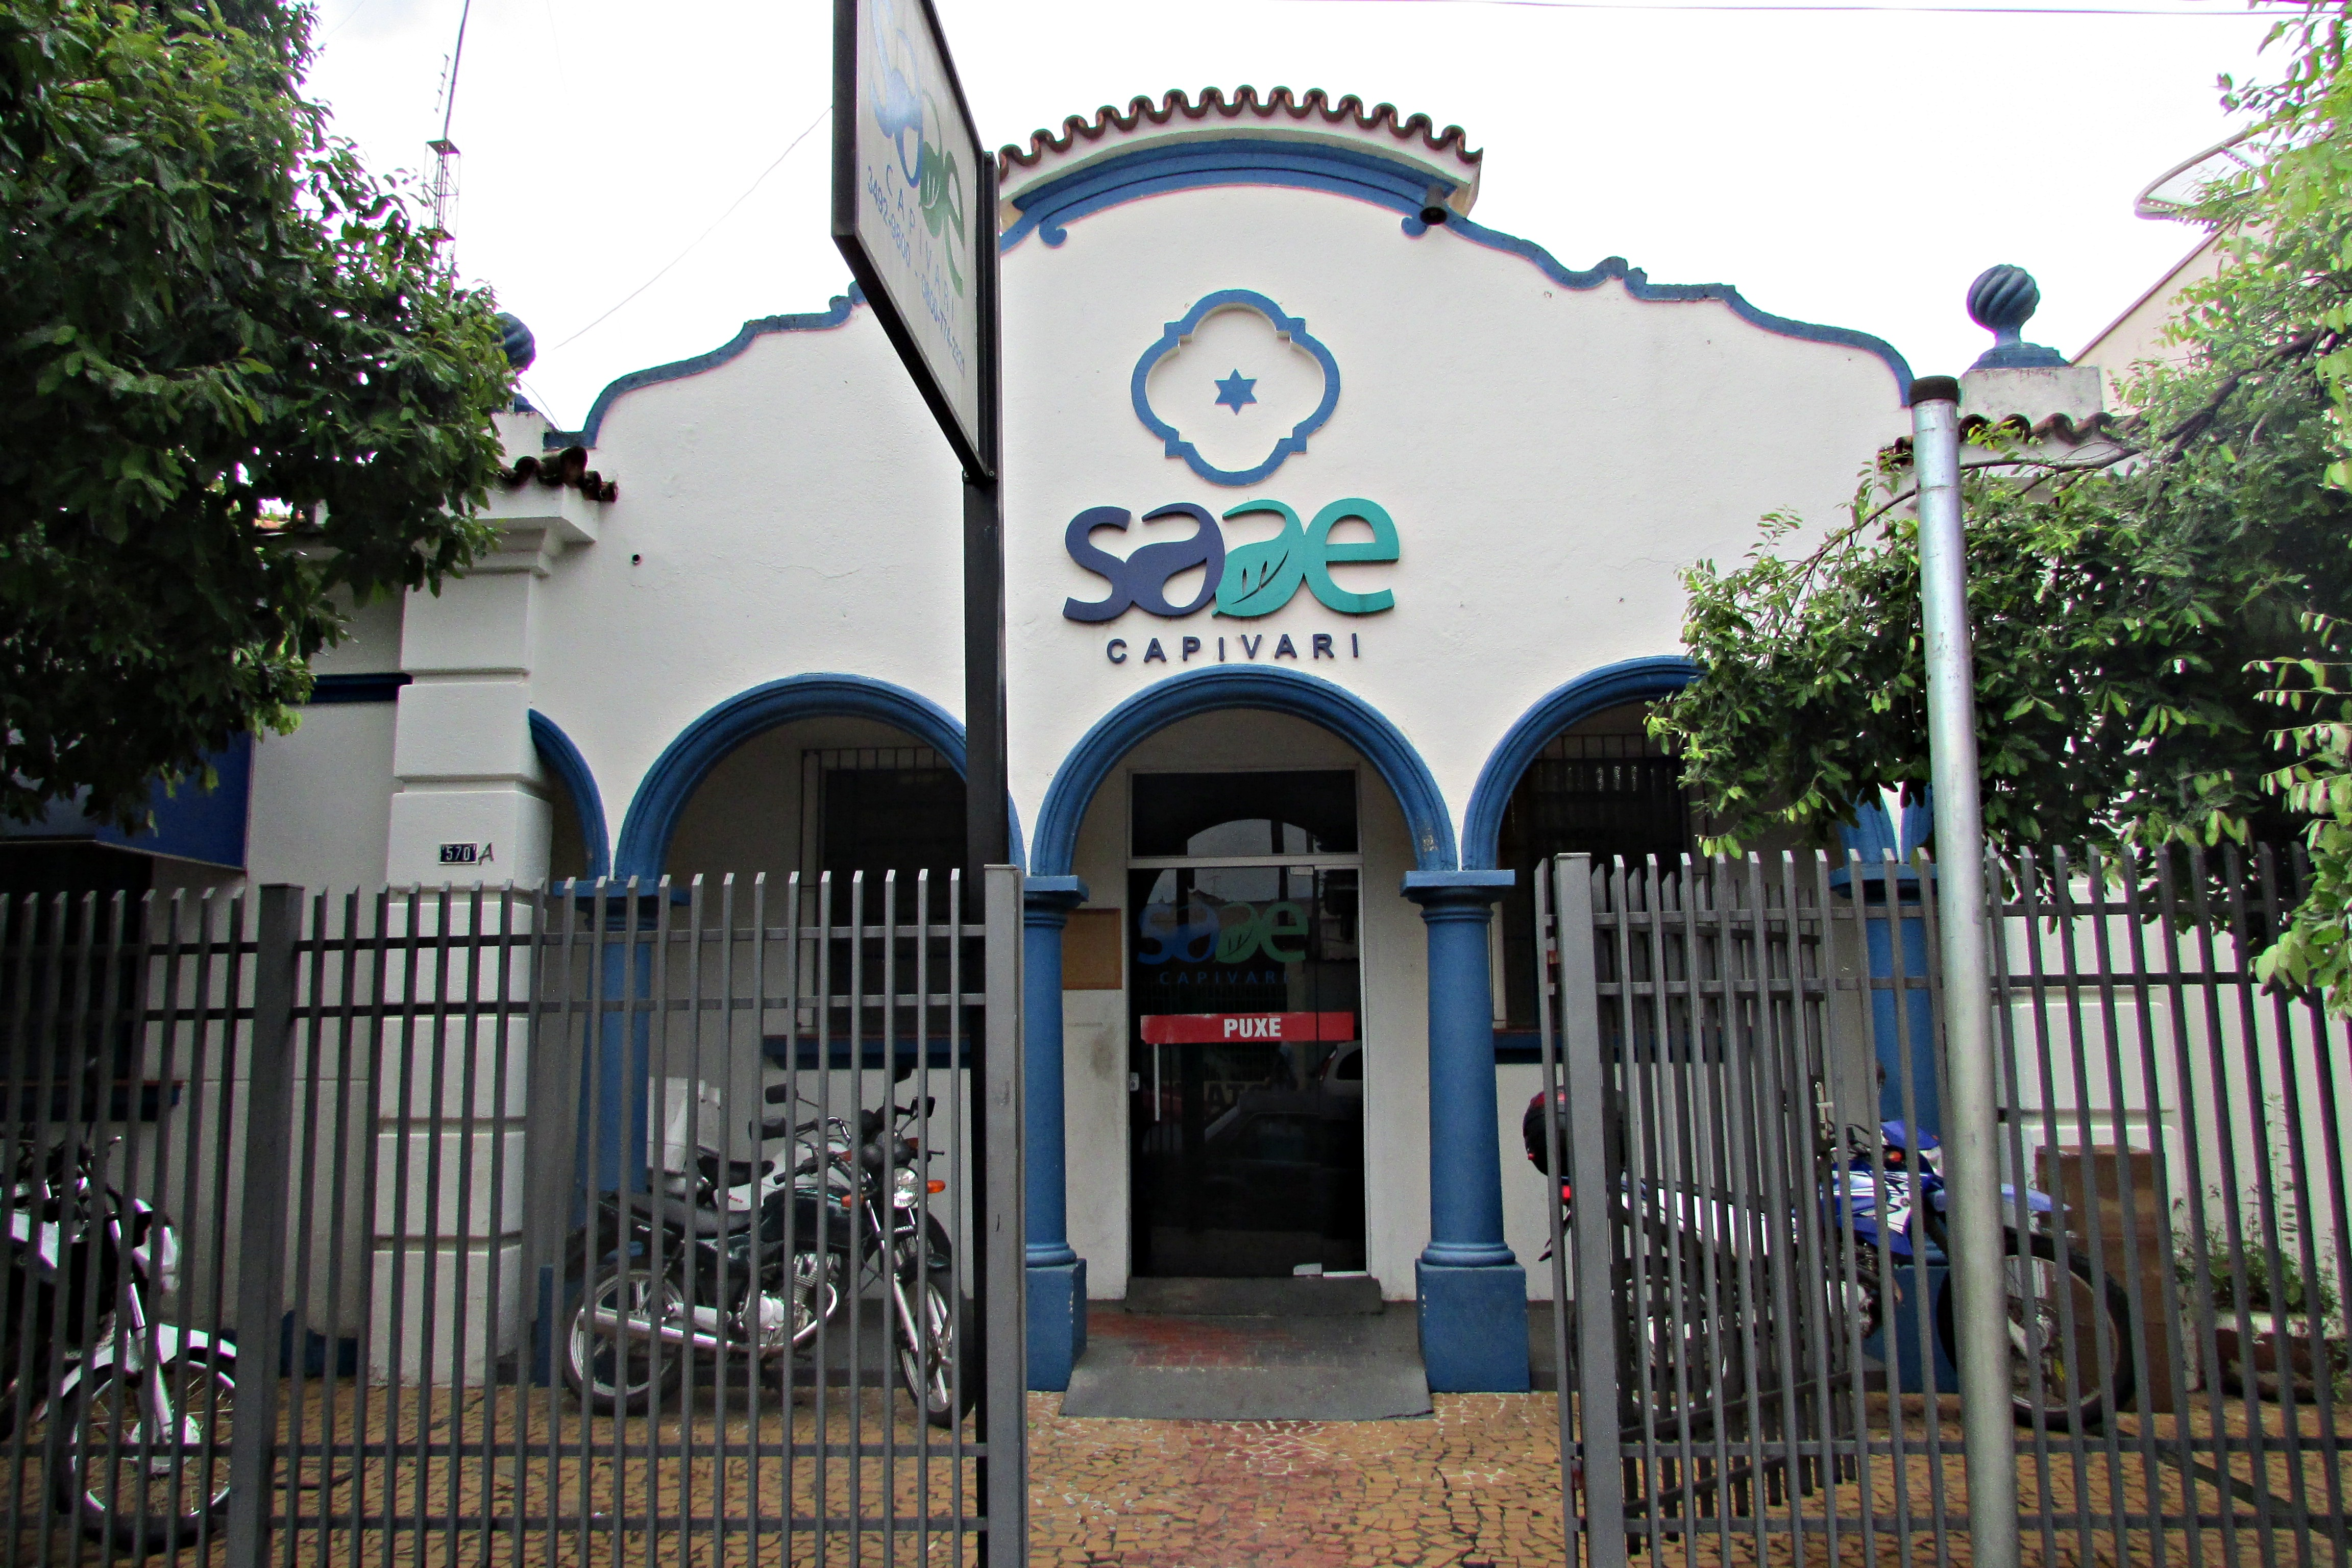 SAAE se programa para atender em novo endereço